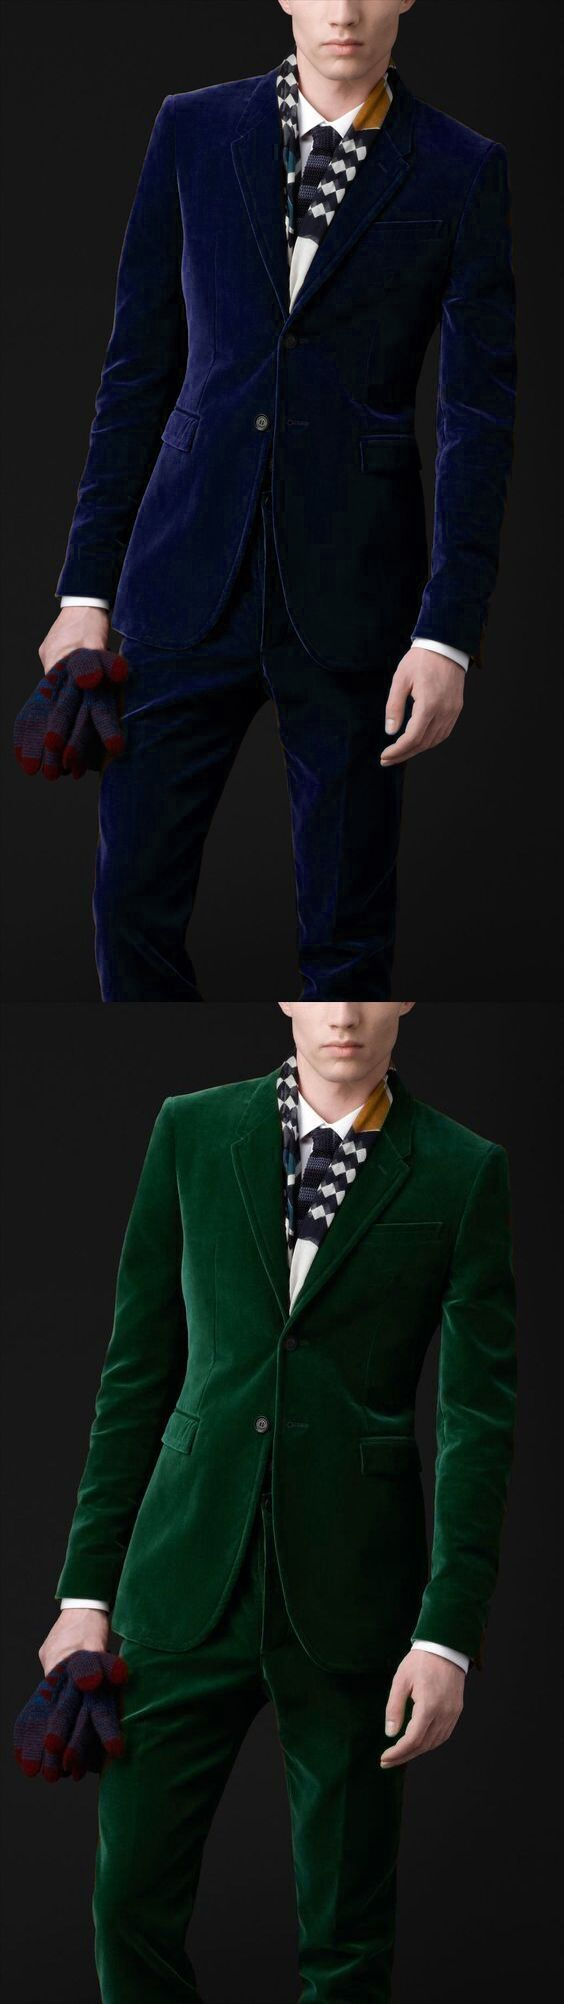 Latest Coat Pant Designs Navy Blue Green Velvet Prom Men Suit Slim Fit Tuxedo 2 Piece Blazer Custom Groom Suits Terno Masculino